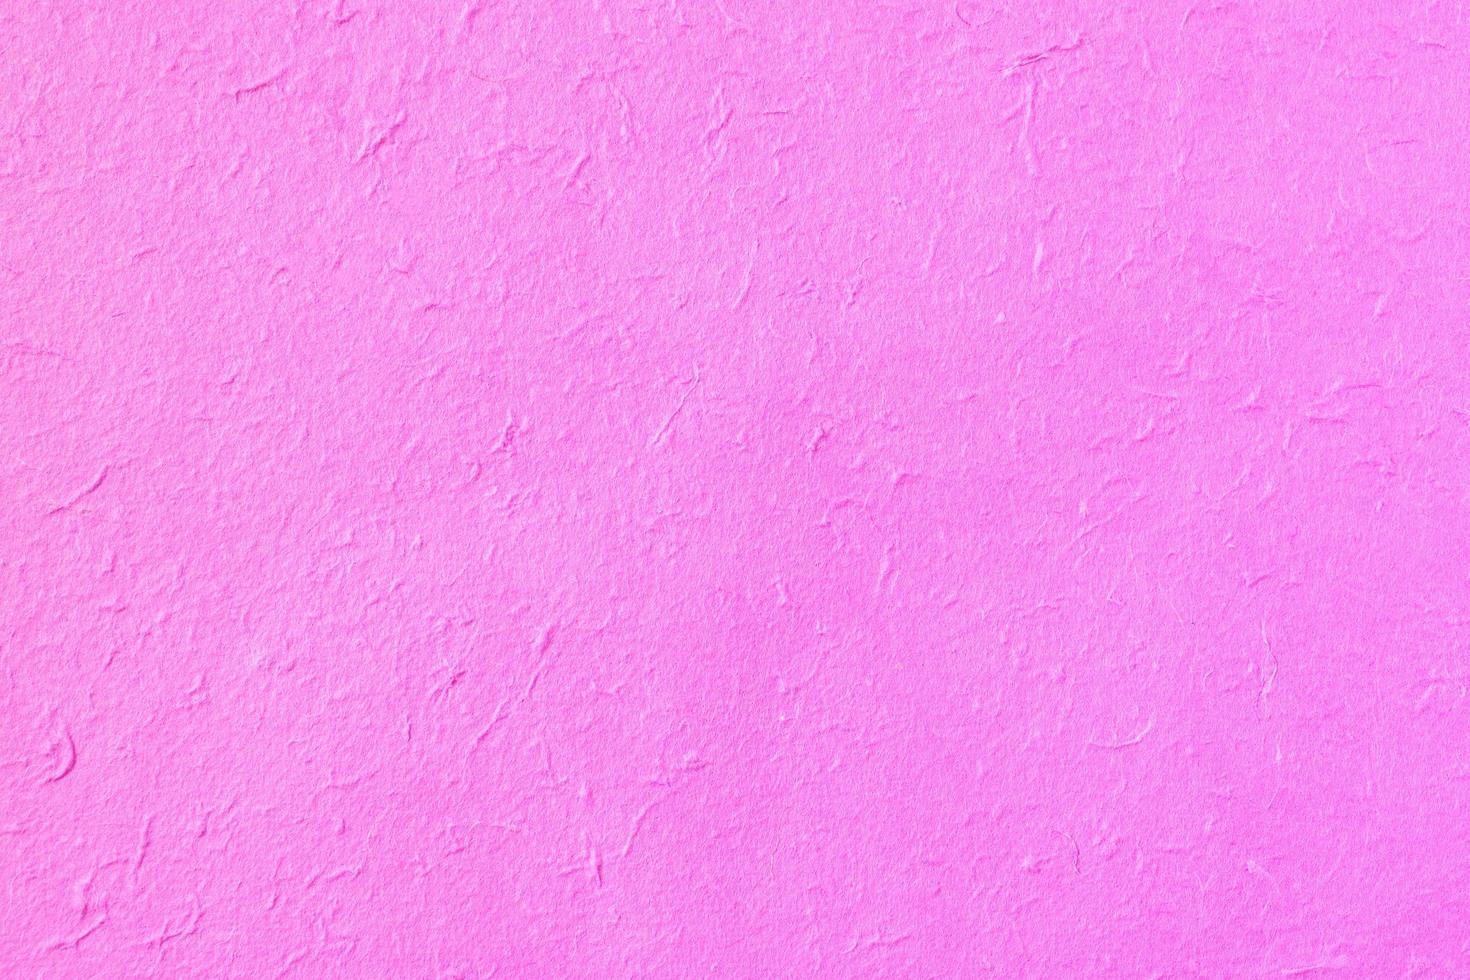 Pink handmade mulberry paper  photo